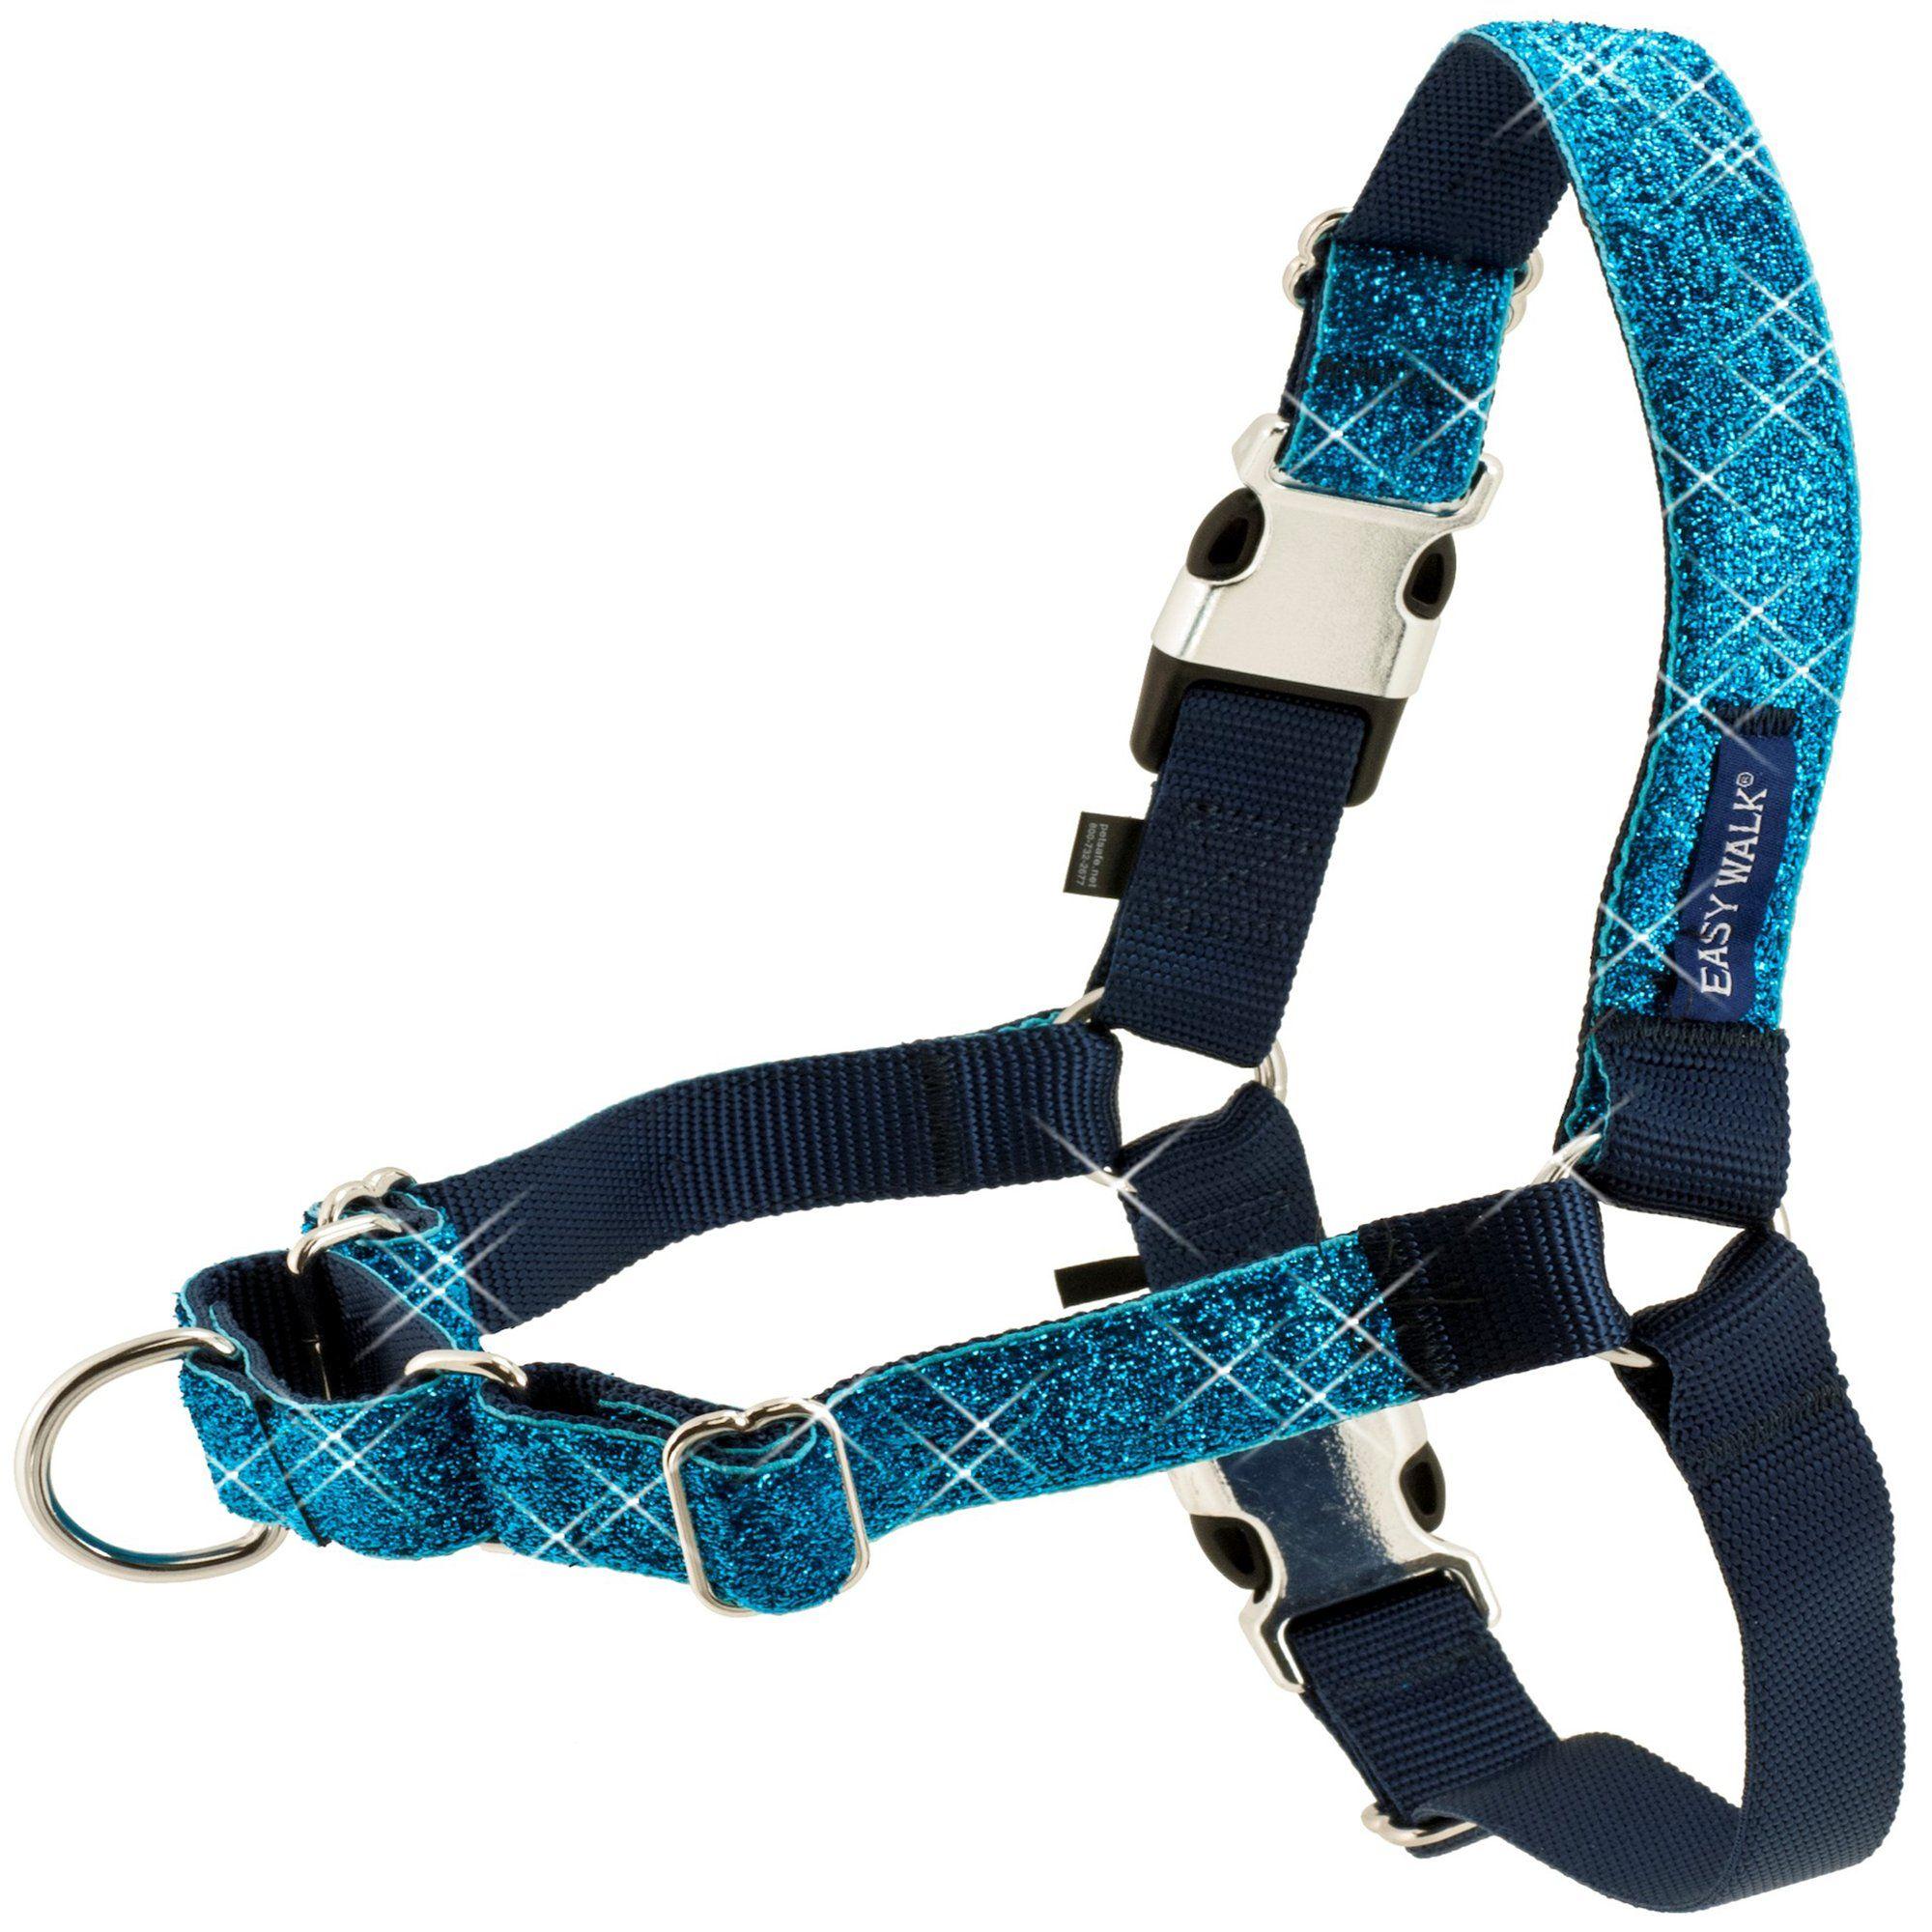 Petsafe Easy Walk Harness In Blue Bling Small Produtos Pet